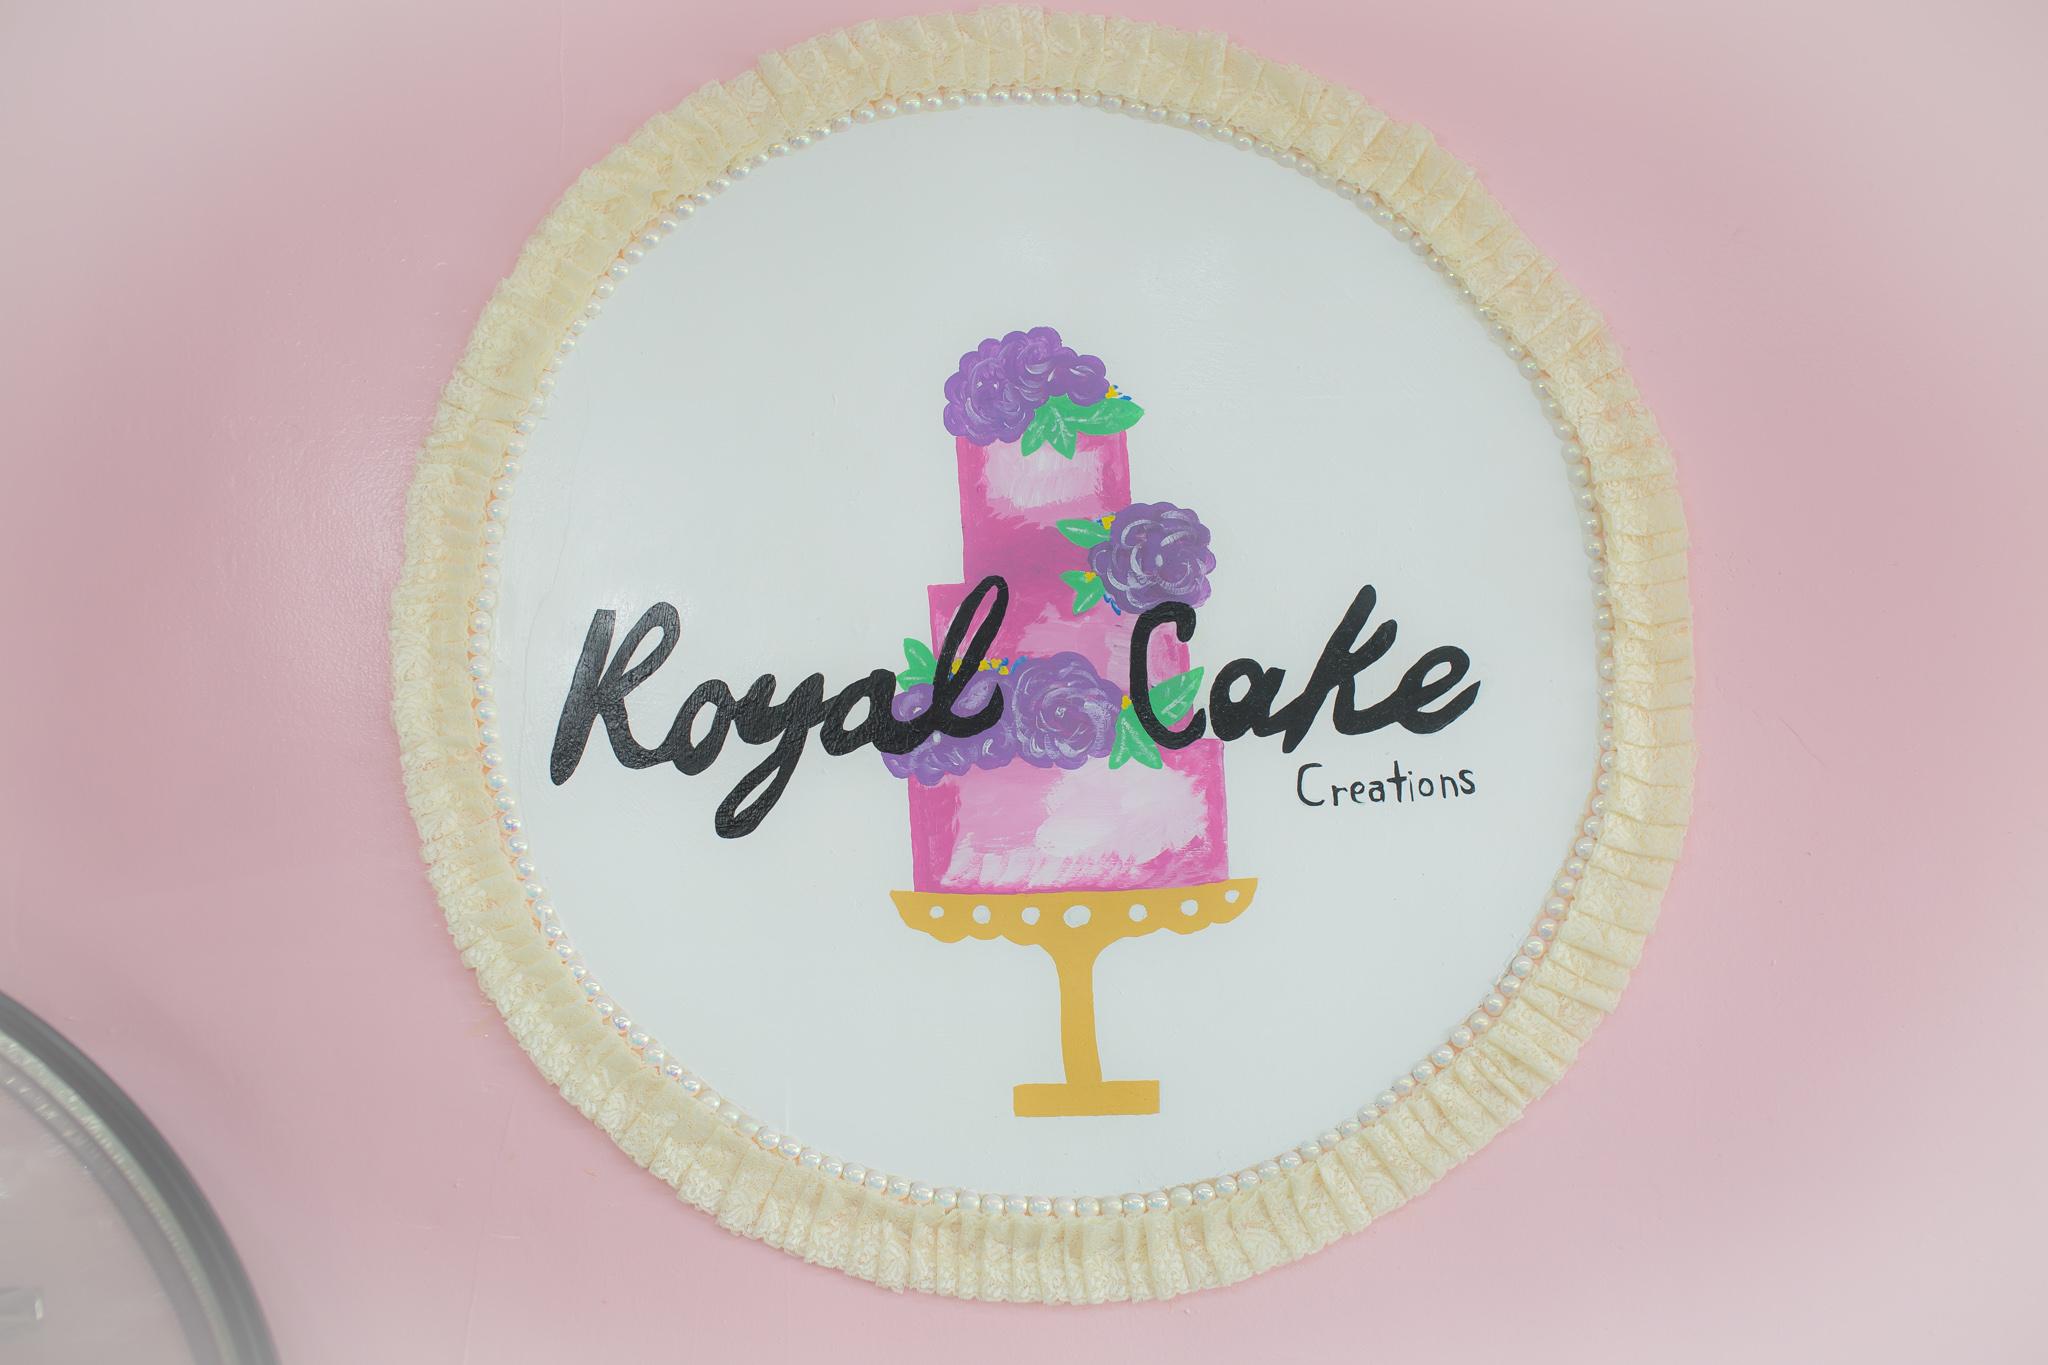 Royal Cake Creations